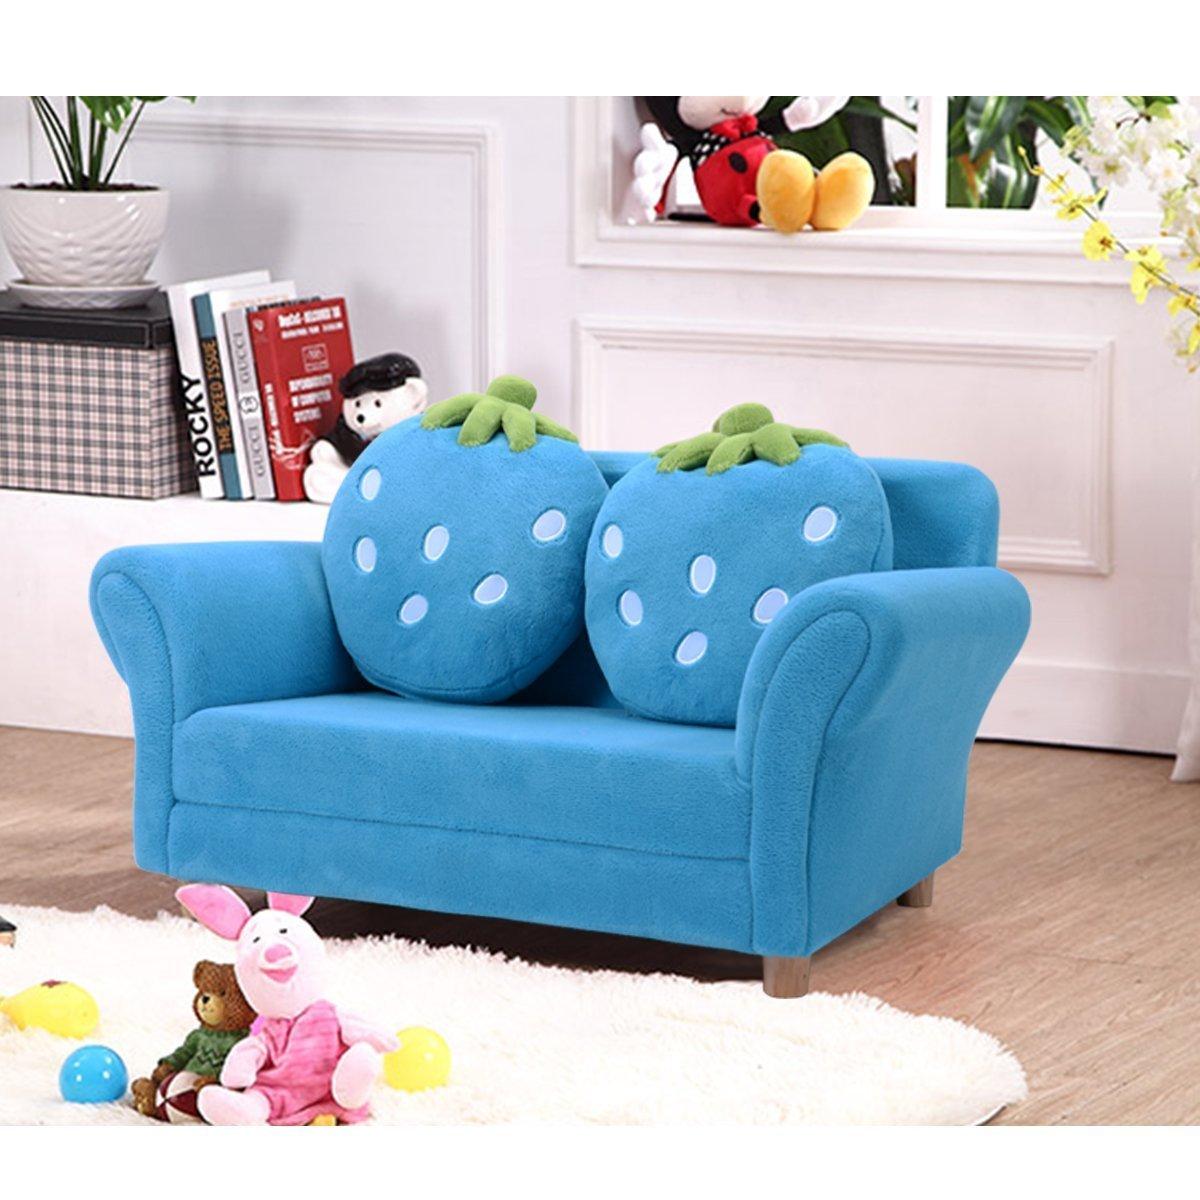 Costzon Kids Sofa Set